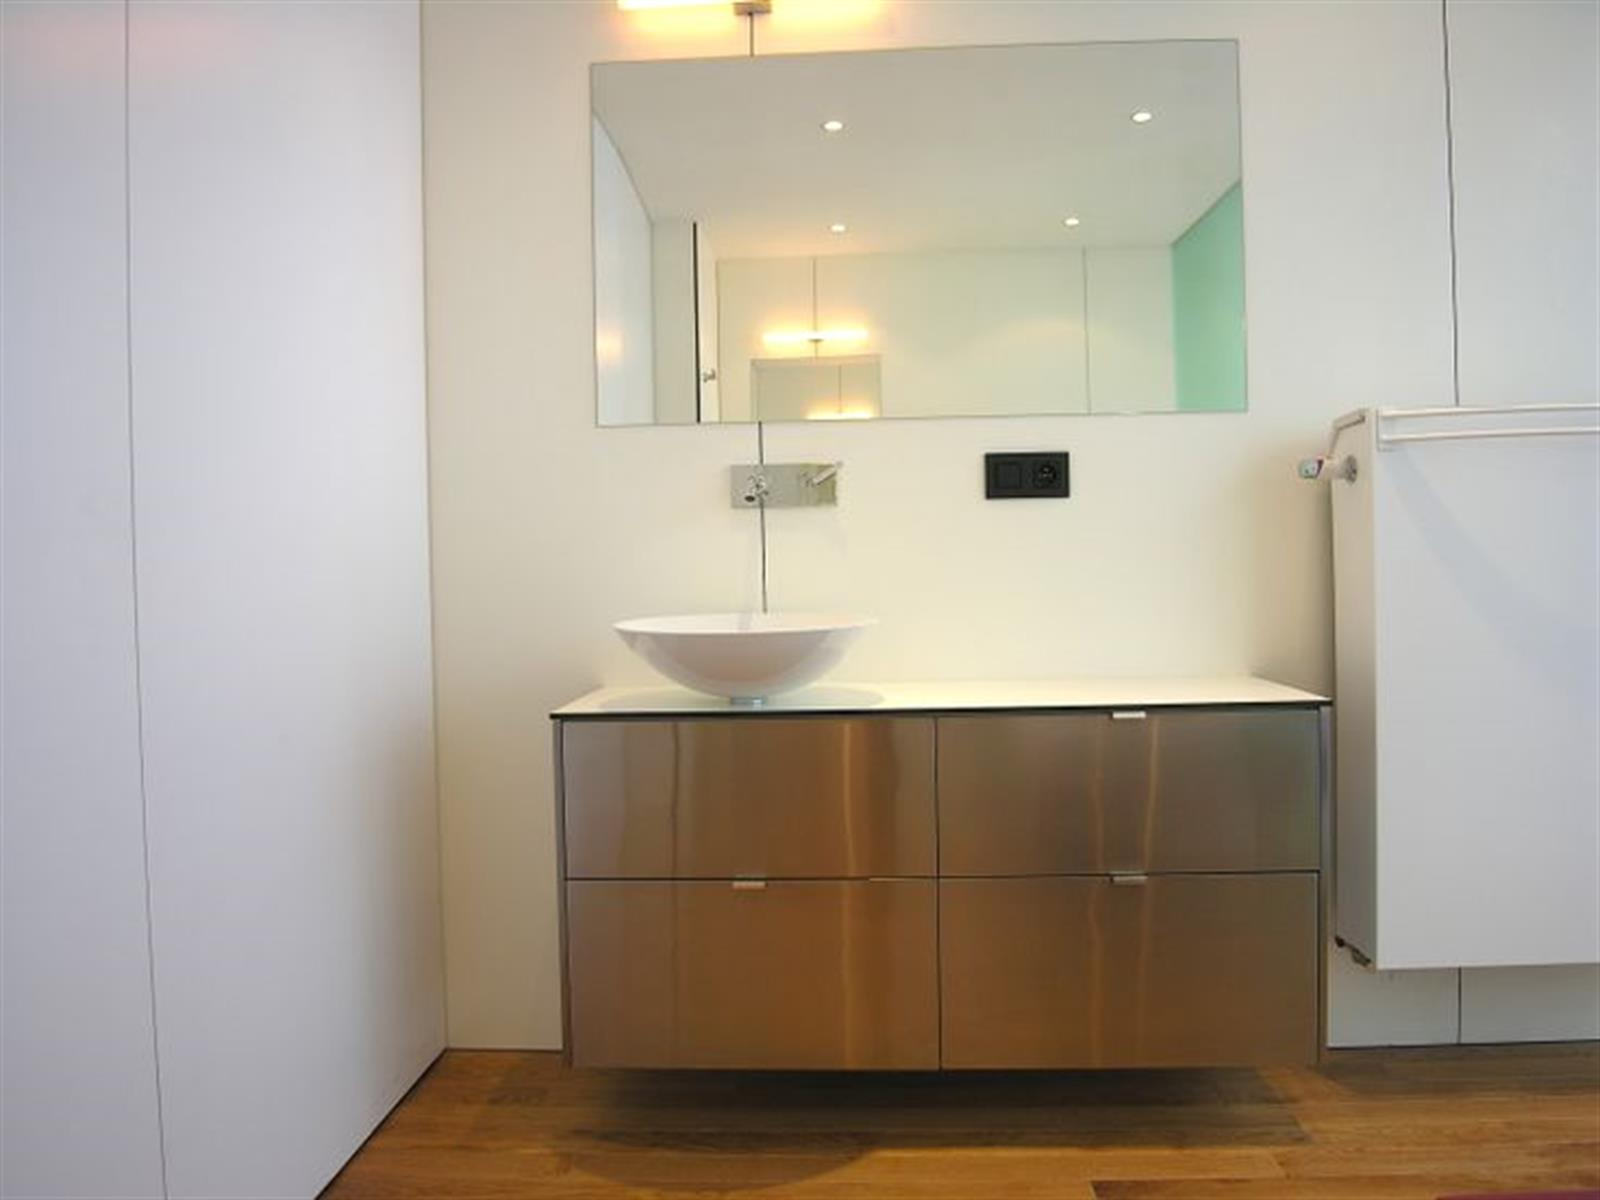 House - Etterbeek - #4448725-15